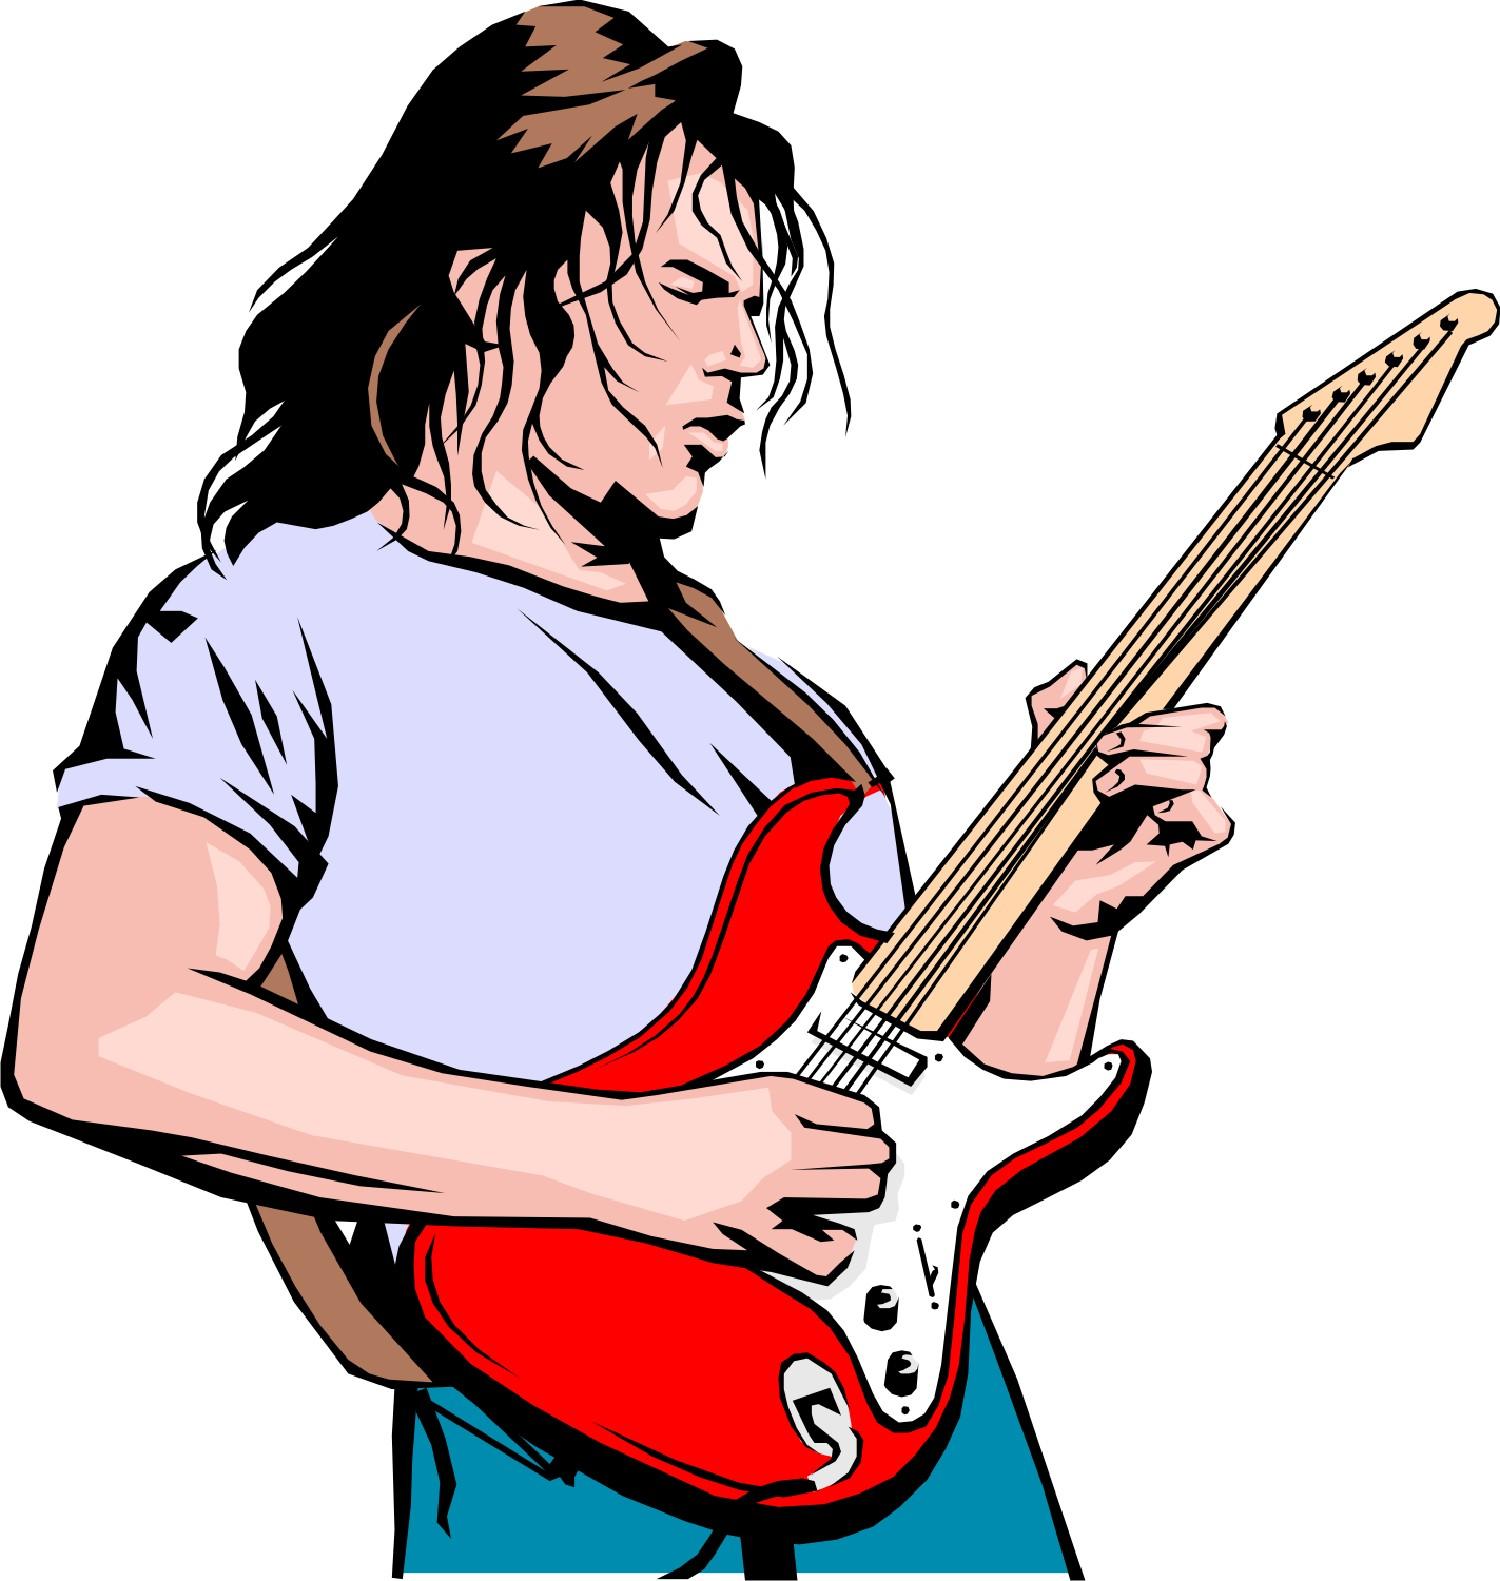 Rock Music Clipart - fedinvestonline